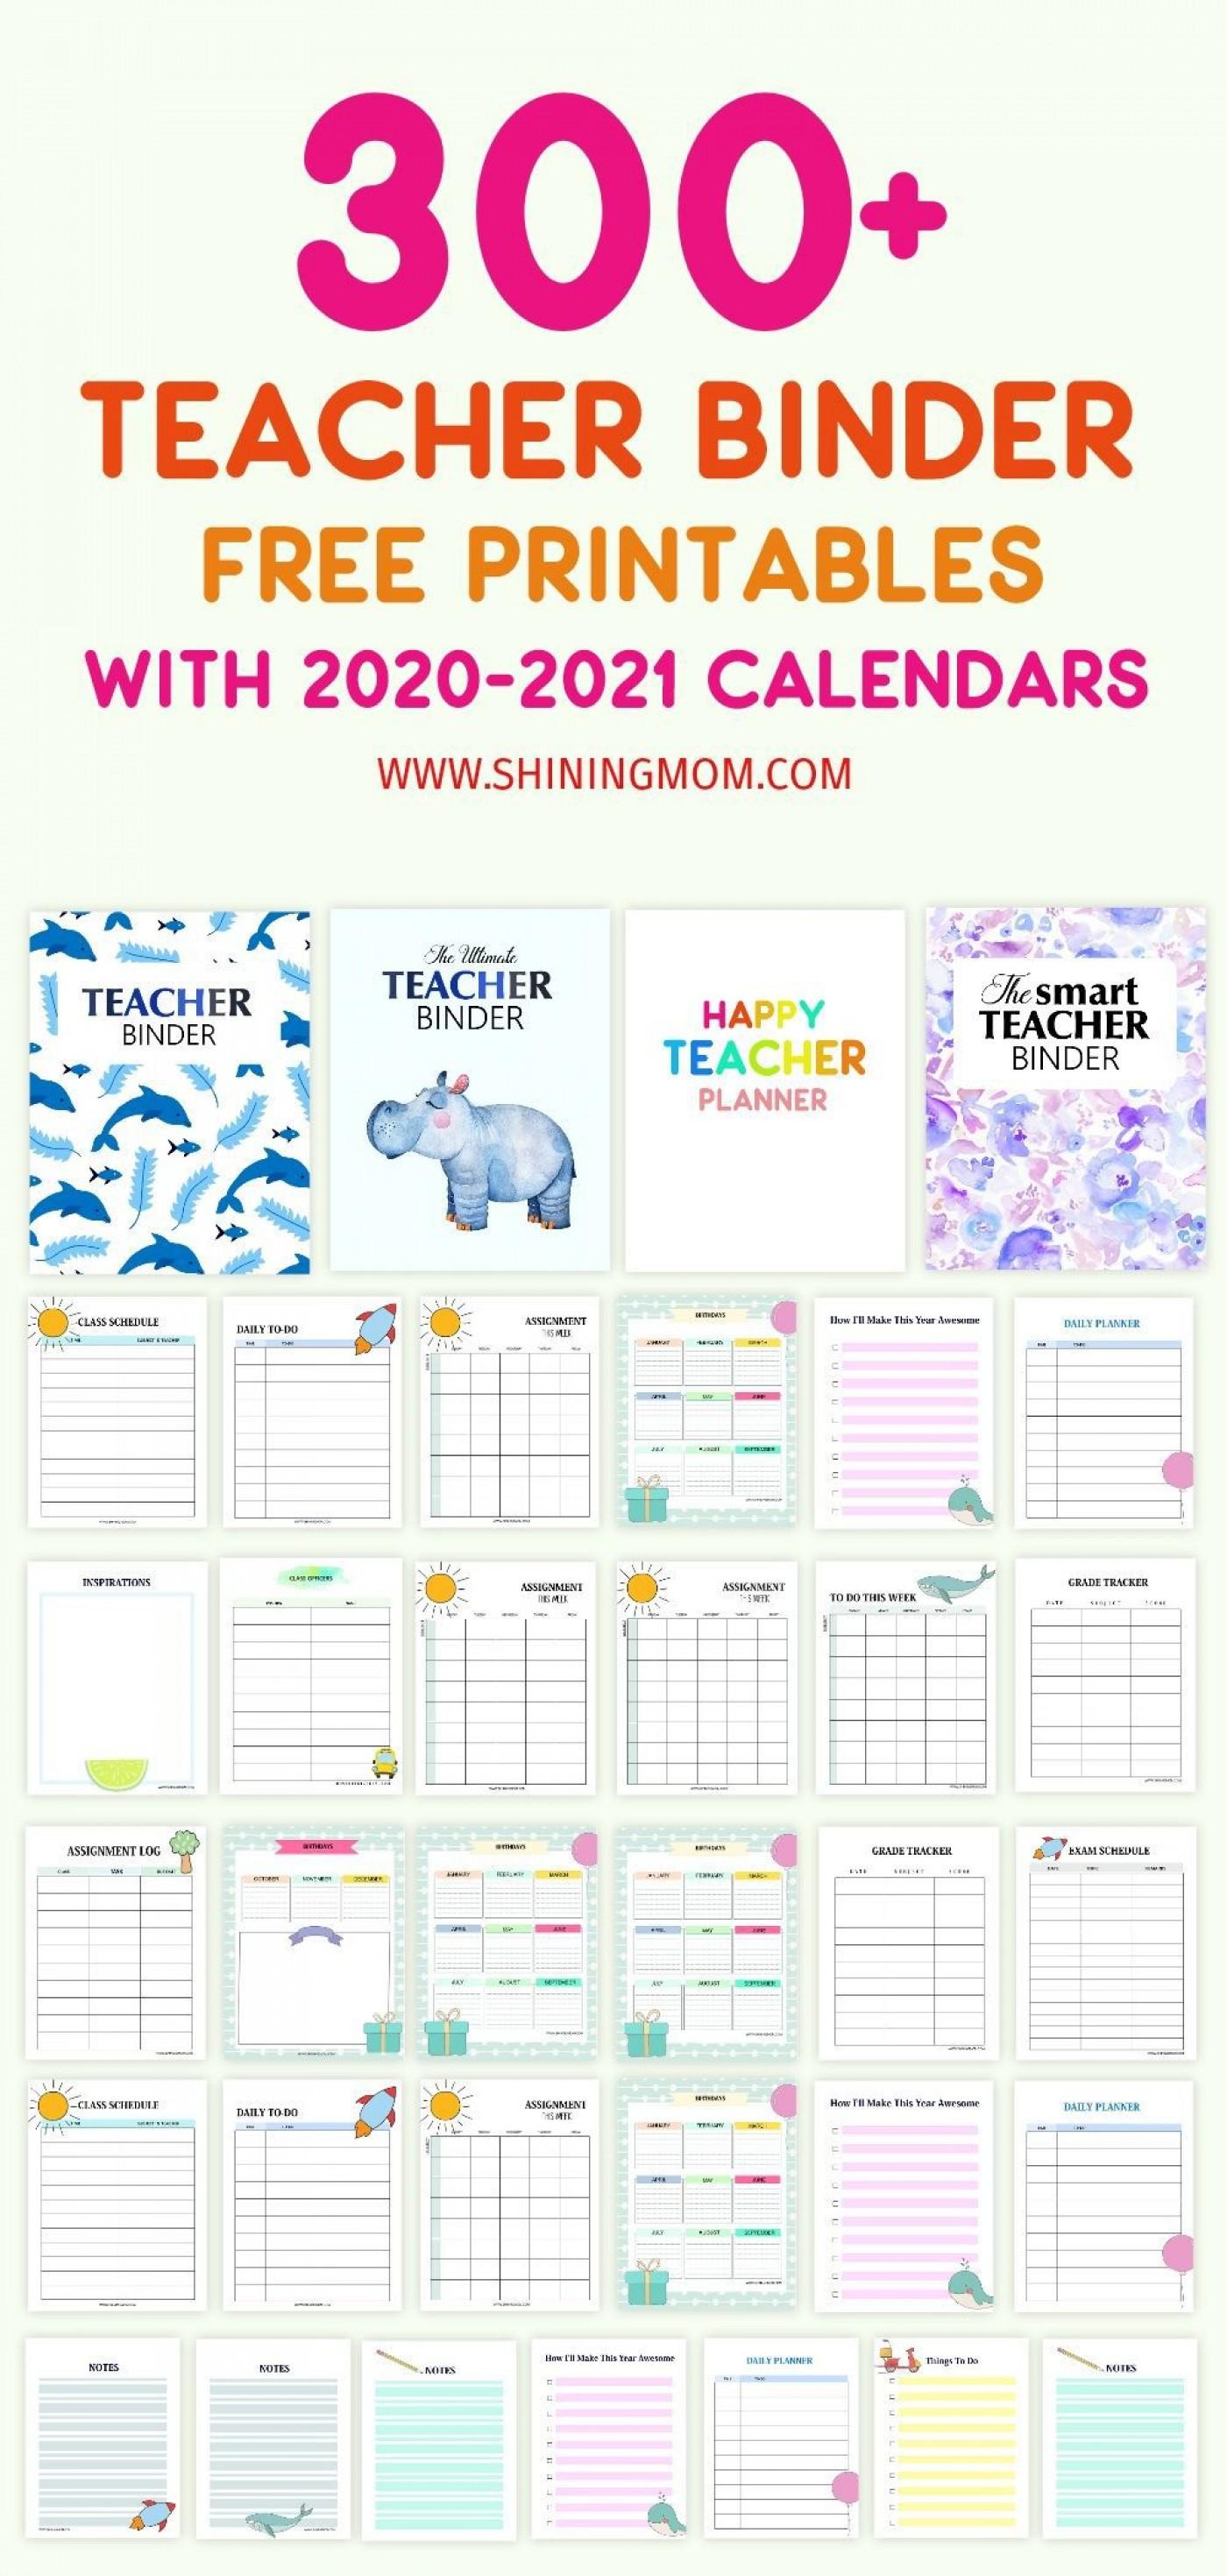 000 Sensational Free Printable Teacher Binder Template High Def 1400